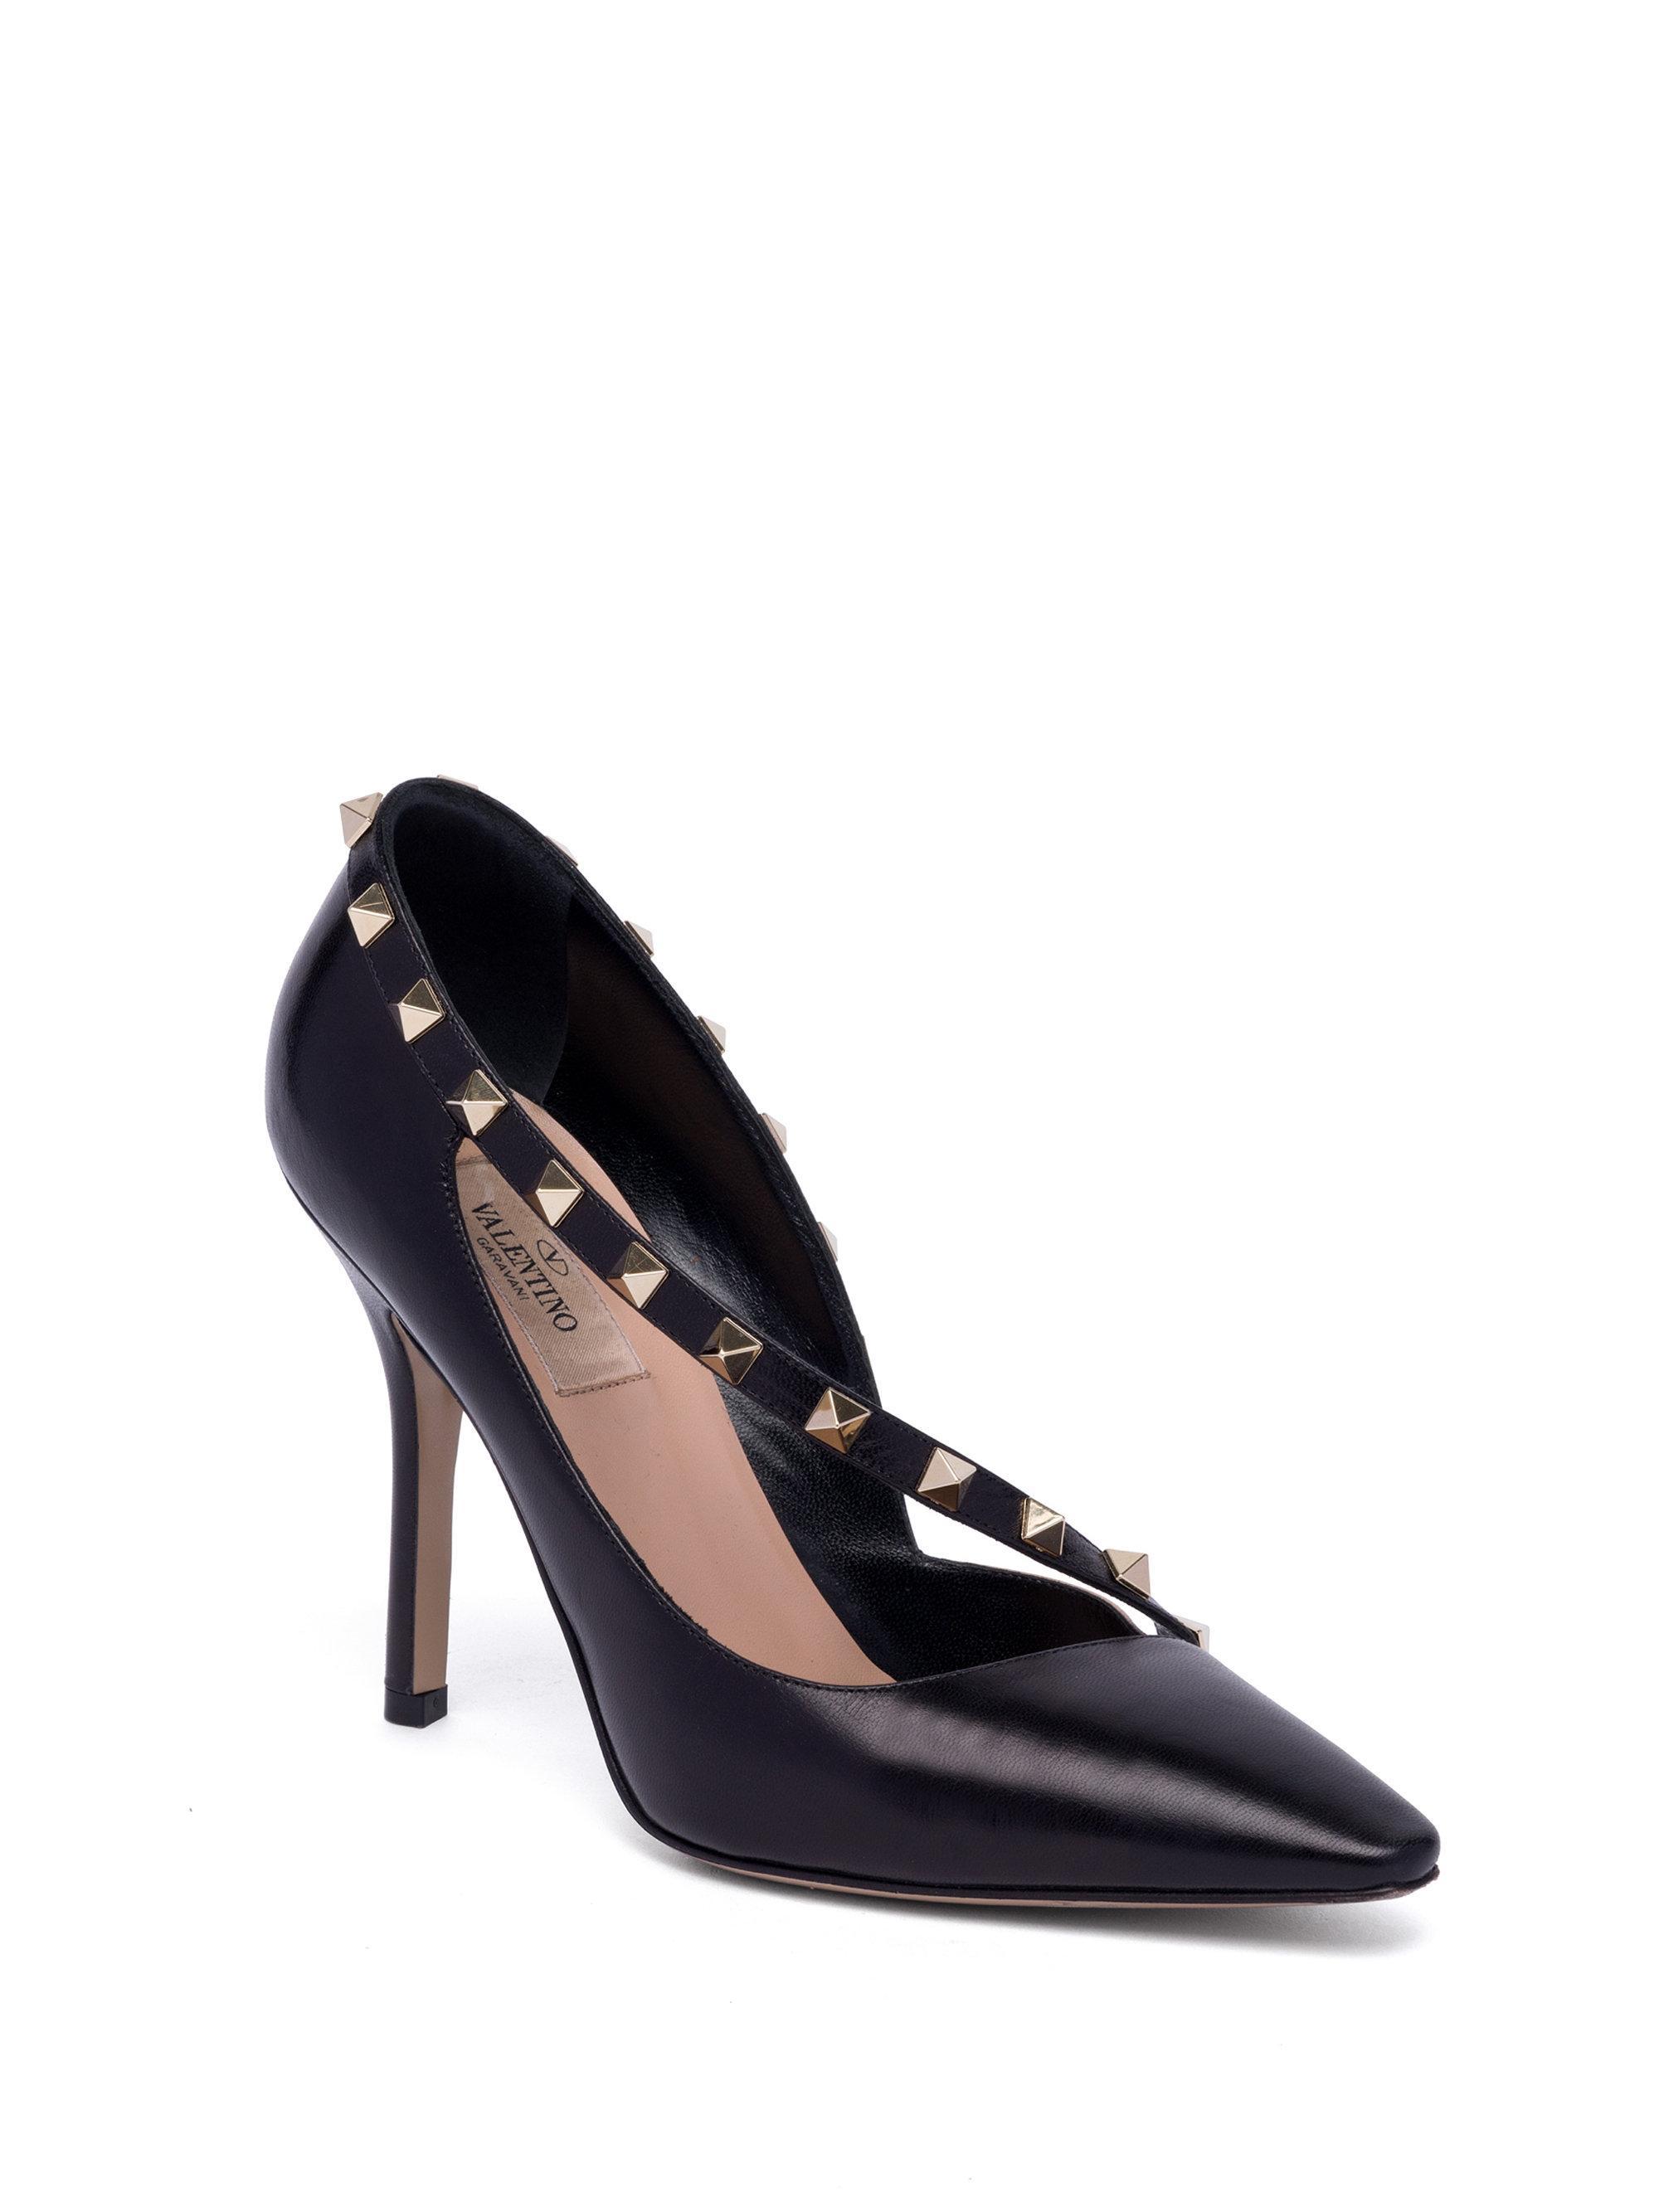 Saks Valentino Shoes Sale